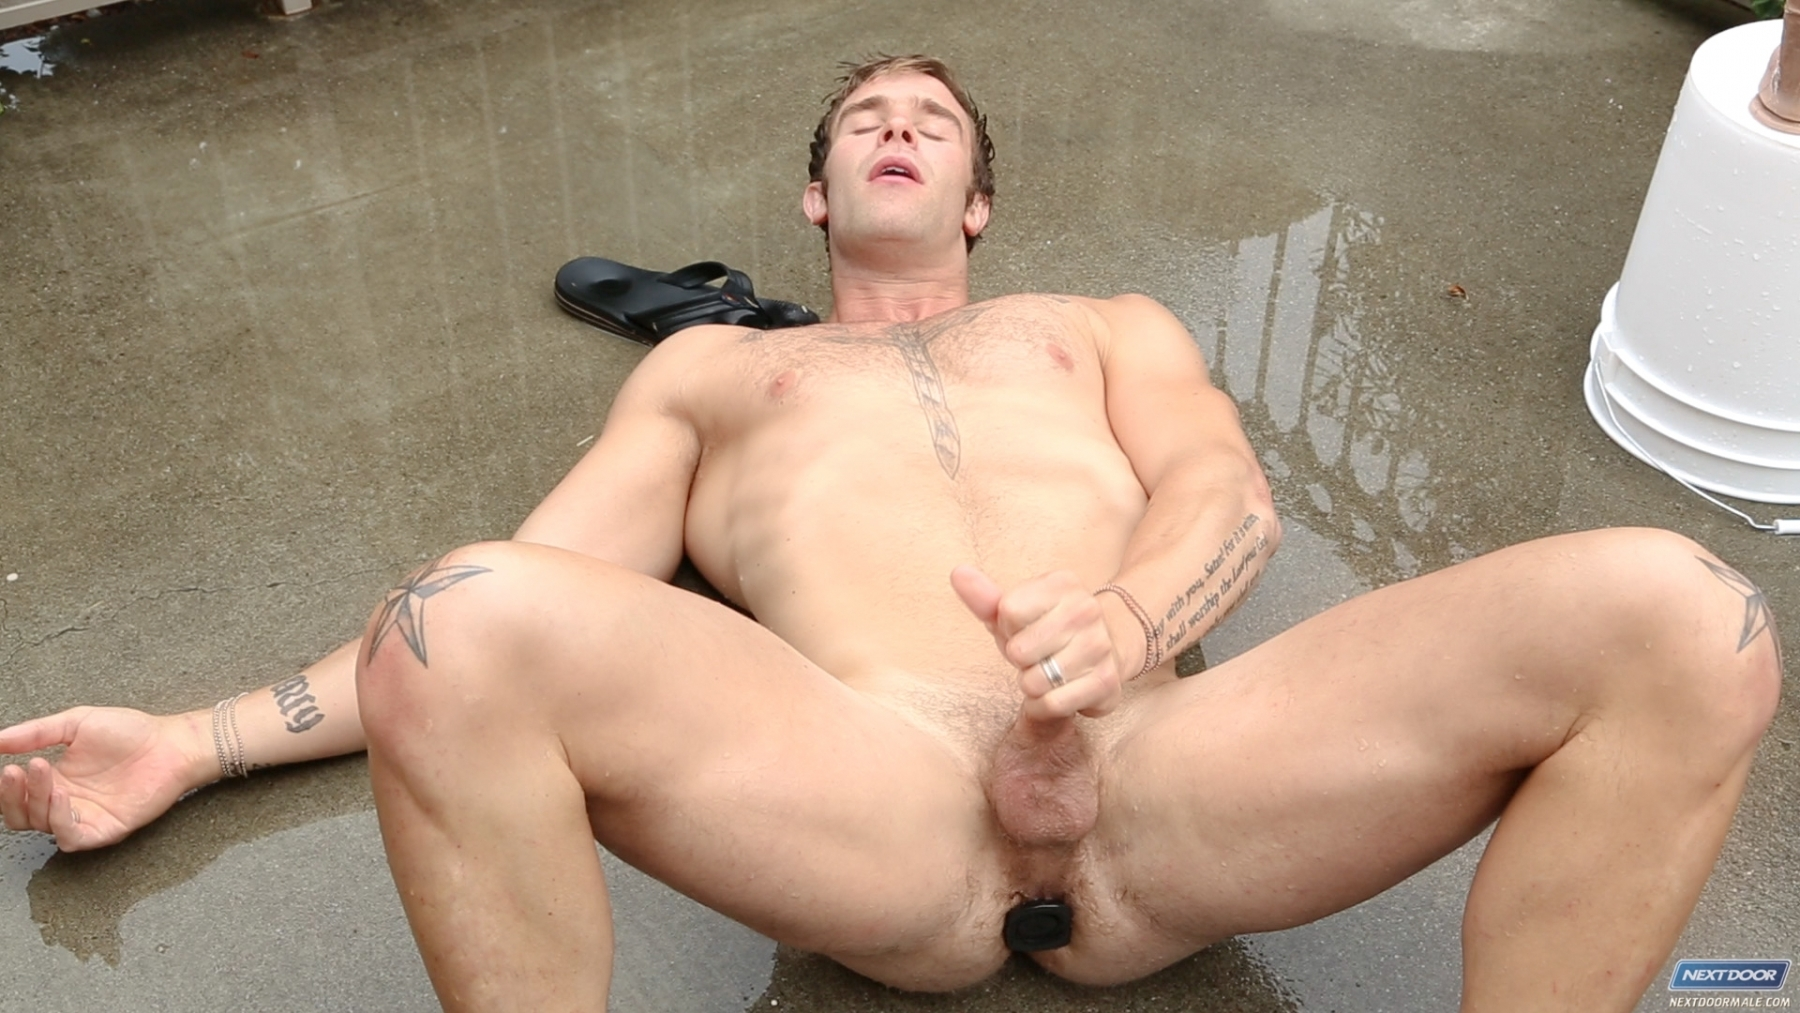 Christian Cayden gay hot dude men daddy porn